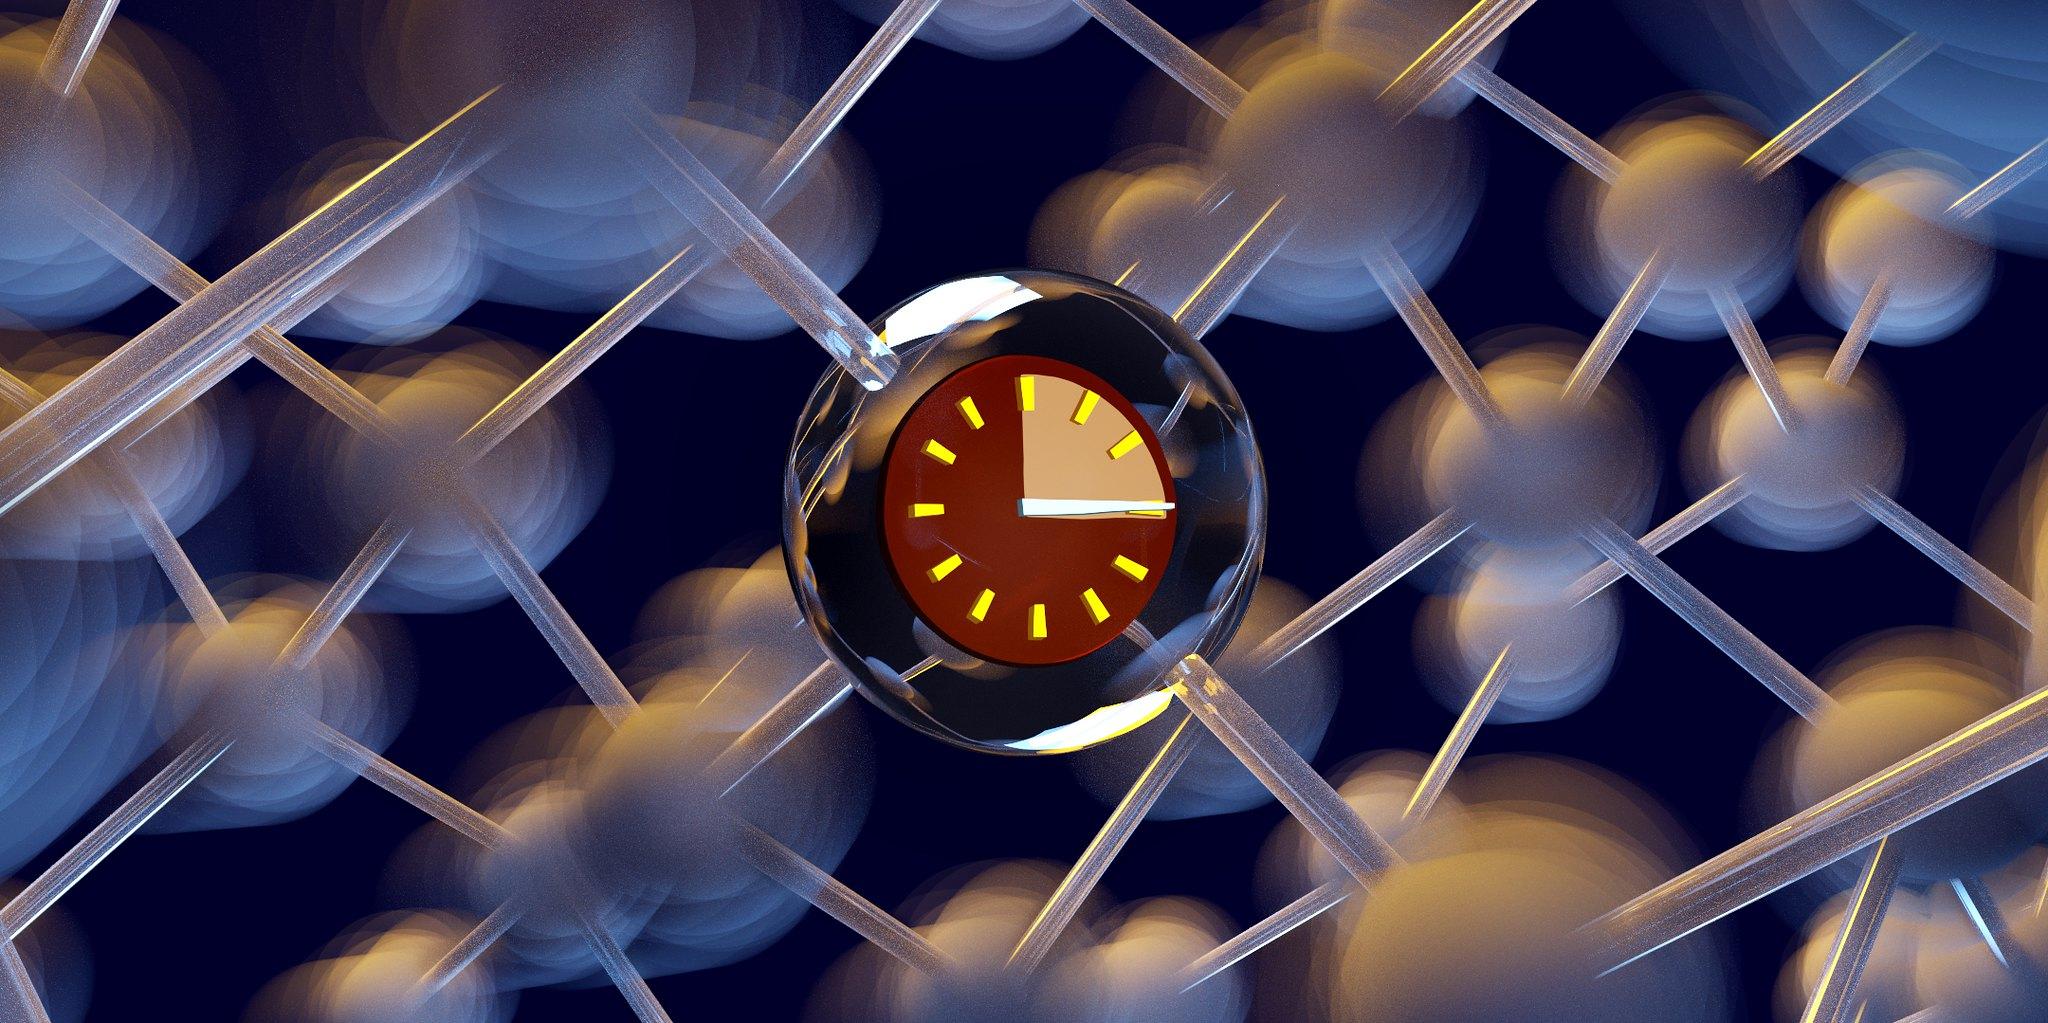 Amazon proposes novel approach to quantum computing error correction - SiliconANGLE